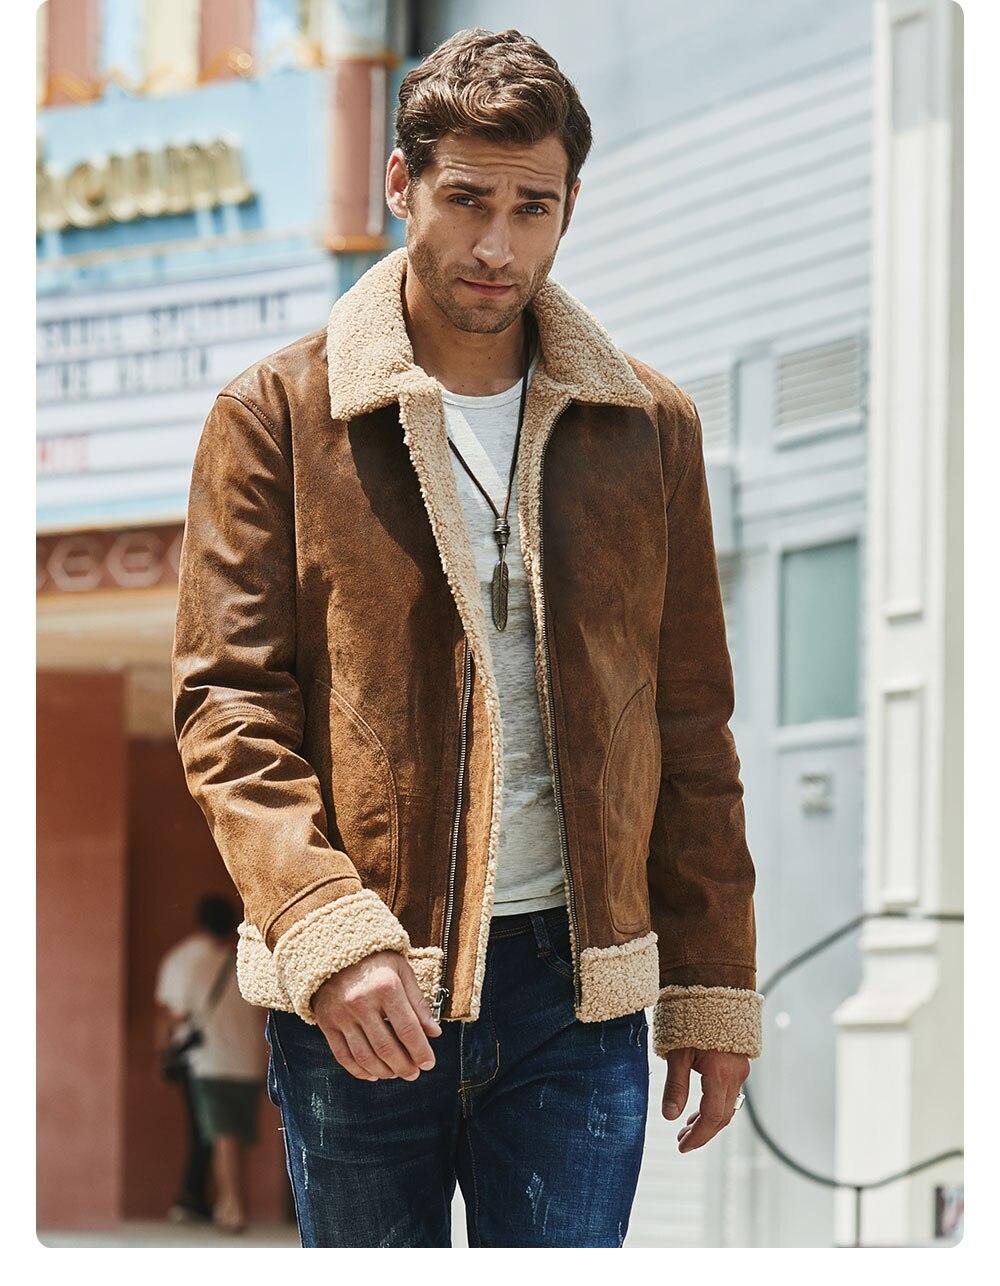 Hca76959724a6401e82e93b5ef3b1da75m New Men's Real Leather Jacket Faux Fur Collar Genuine Leather Jacket